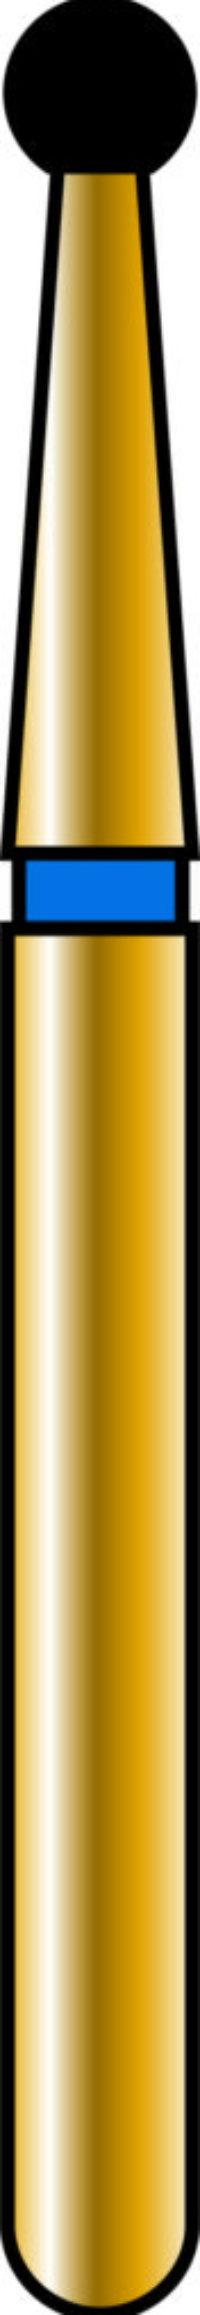 Round 16mm Gold Diamond Bur